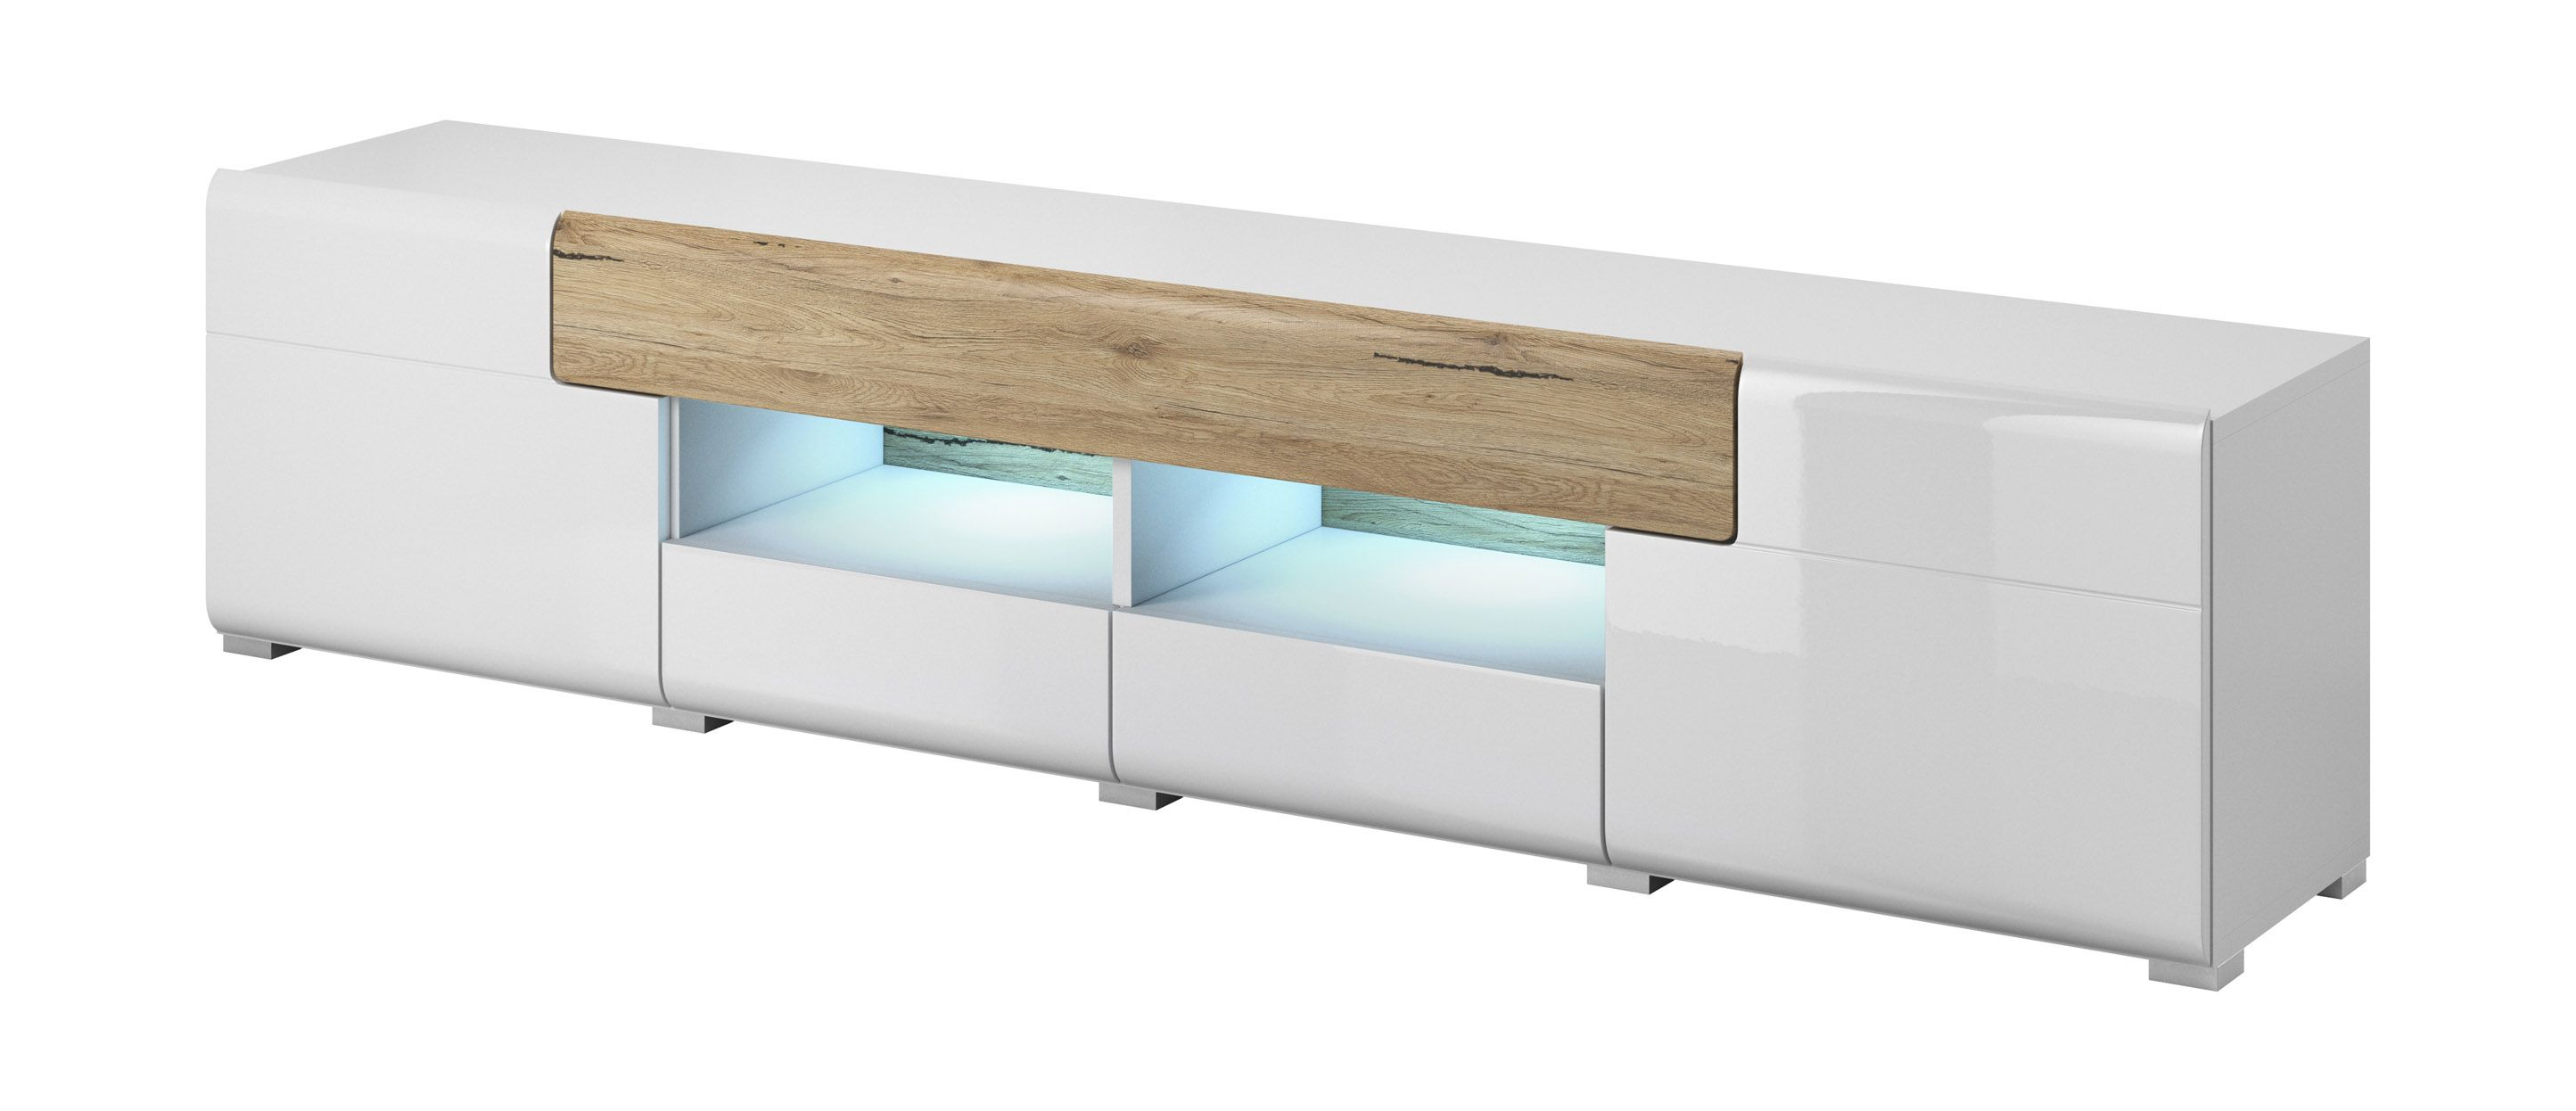 Meuble Tv Angle Bas tv stand toledo typ40 - meuble television | meuble tv angle